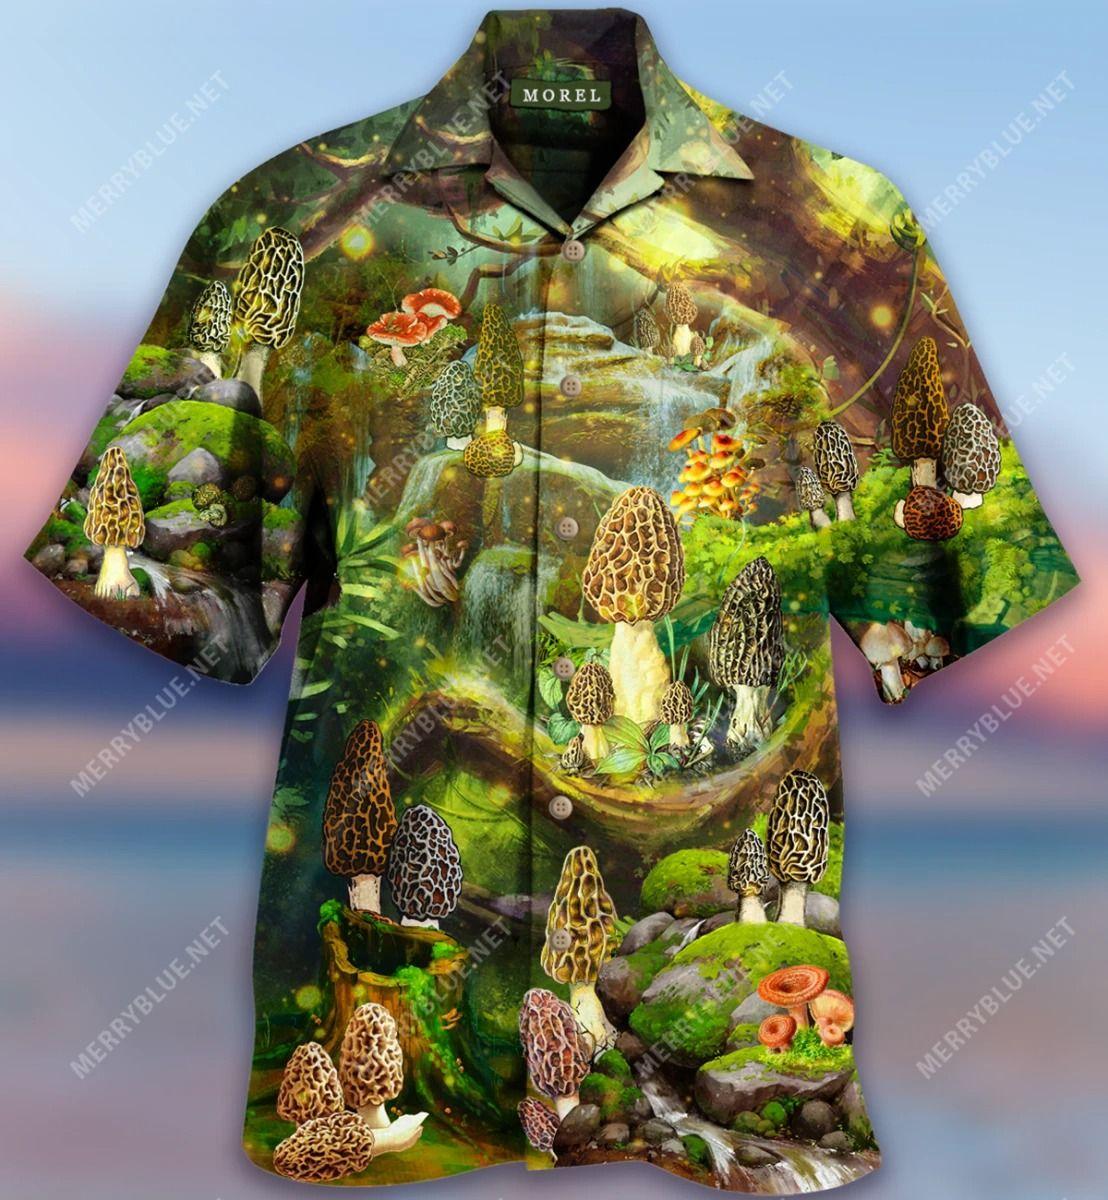 You Can Trust Me I Have Good Morels Mushroom Hawaiian Shirt